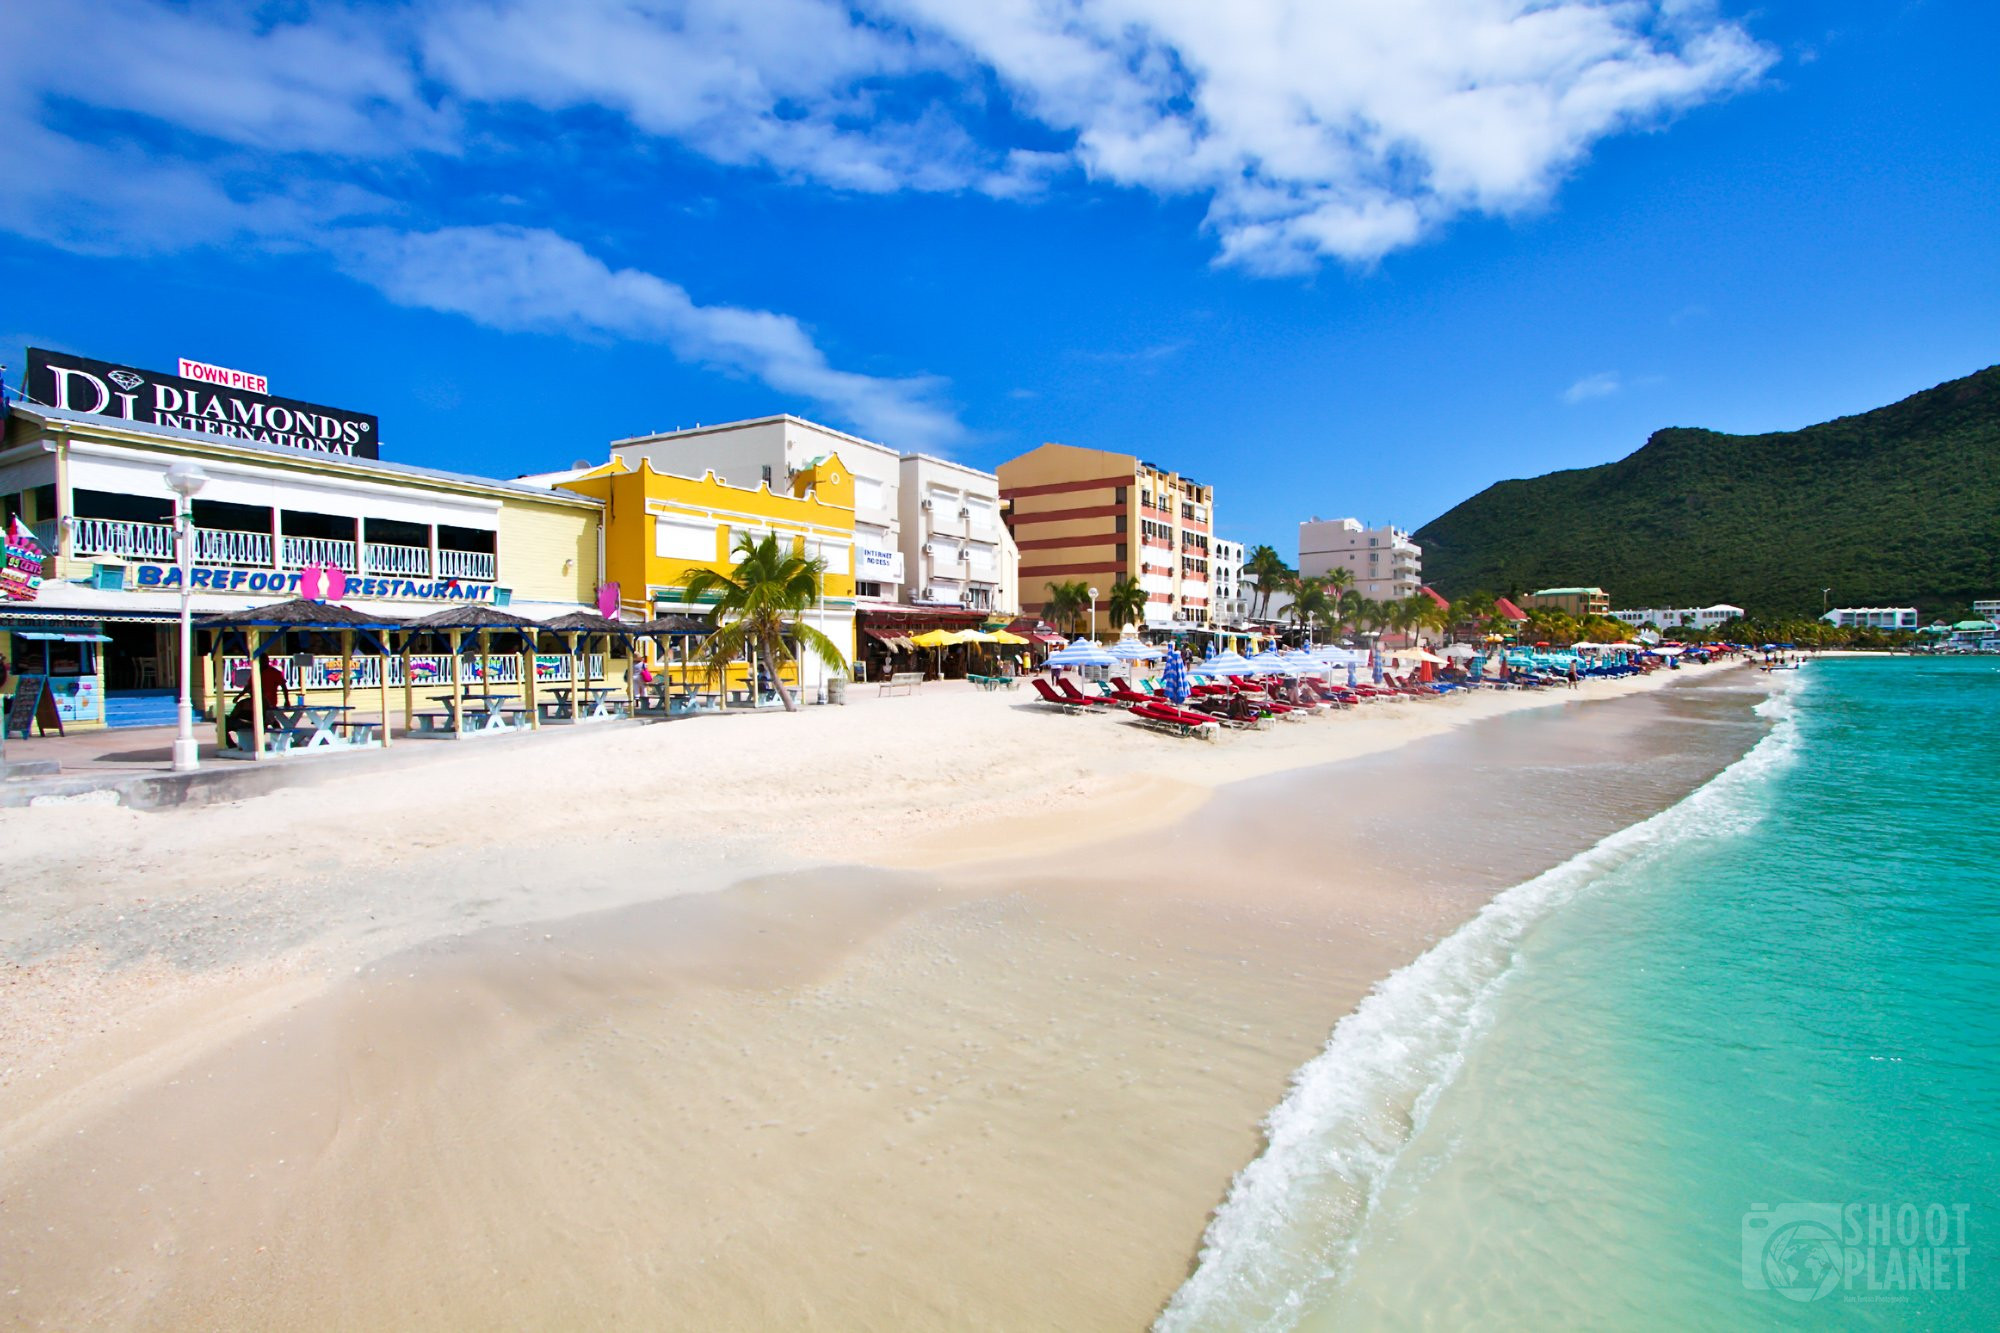 beach and diamond shop, Saint Martin Caribbean